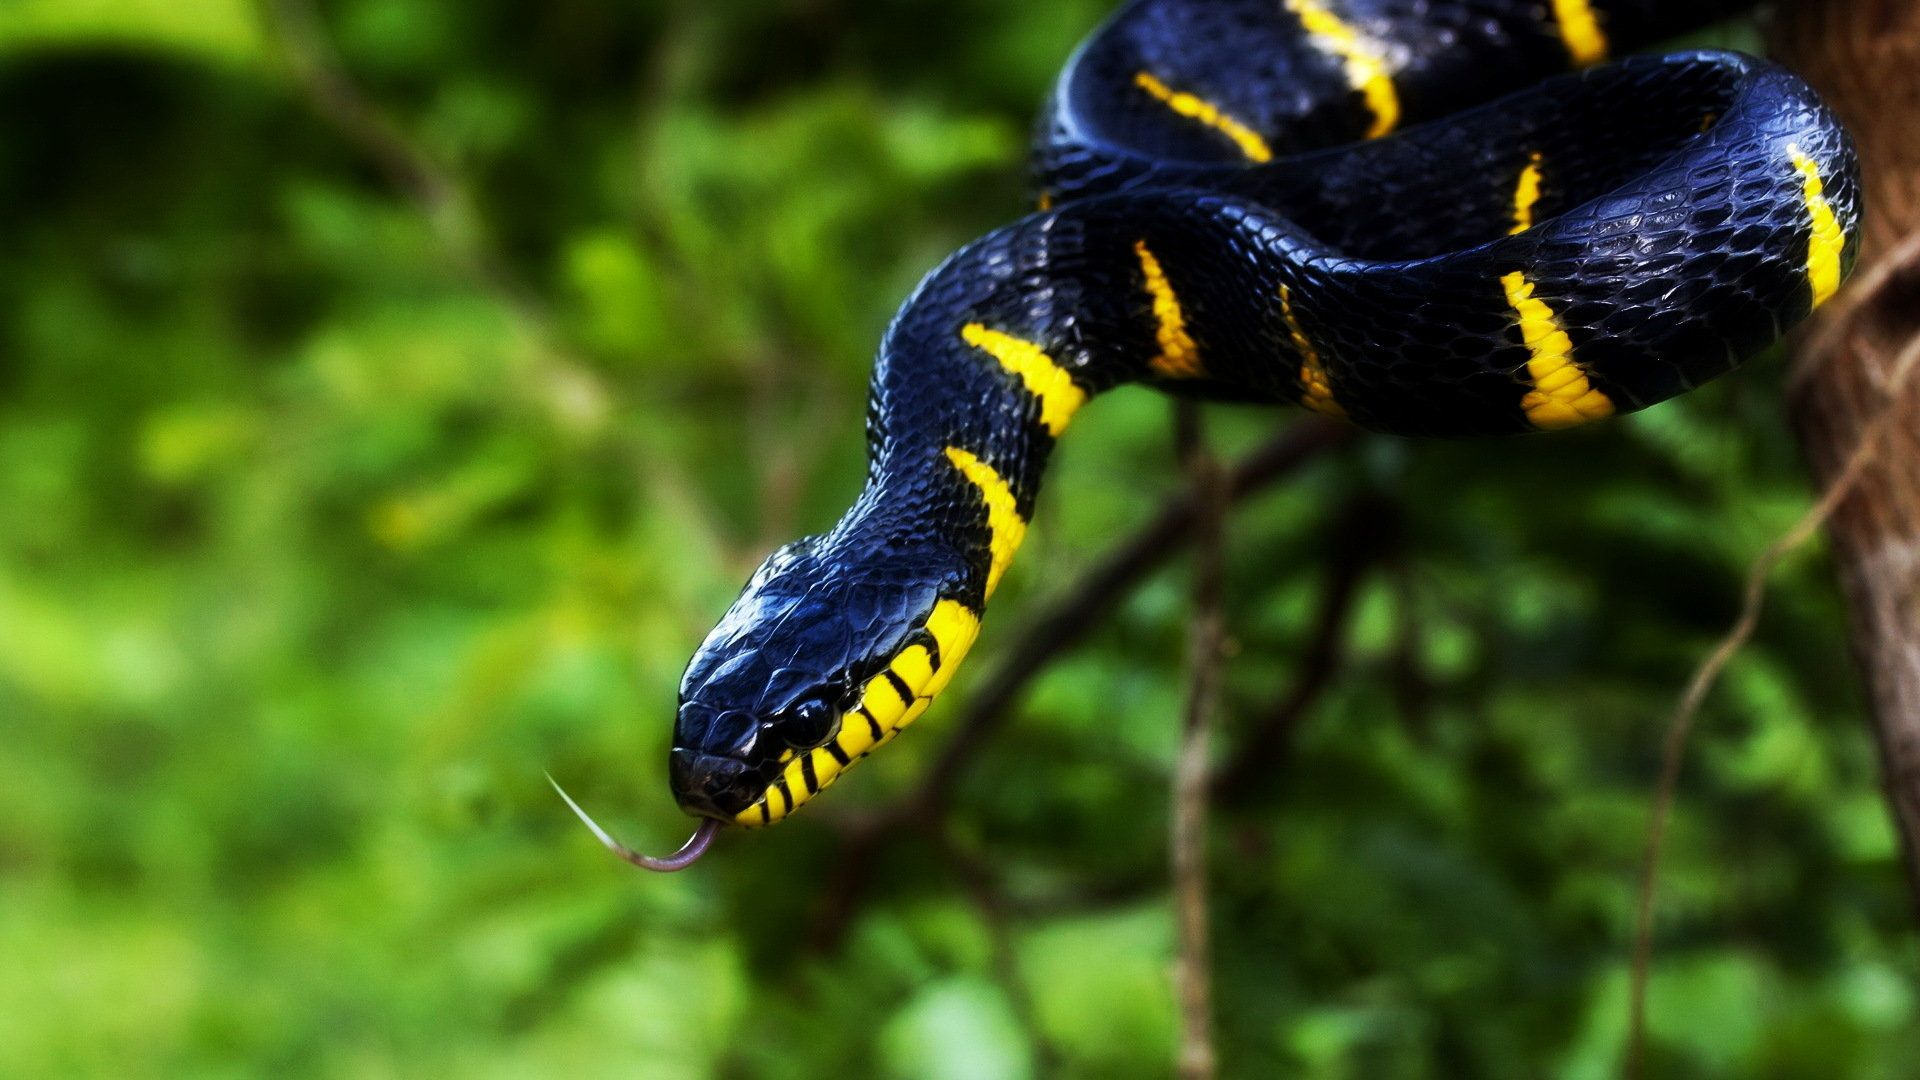 Snake Desktop Wallpapers Top Free Snake Desktop Backgrounds Wallpaperaccess